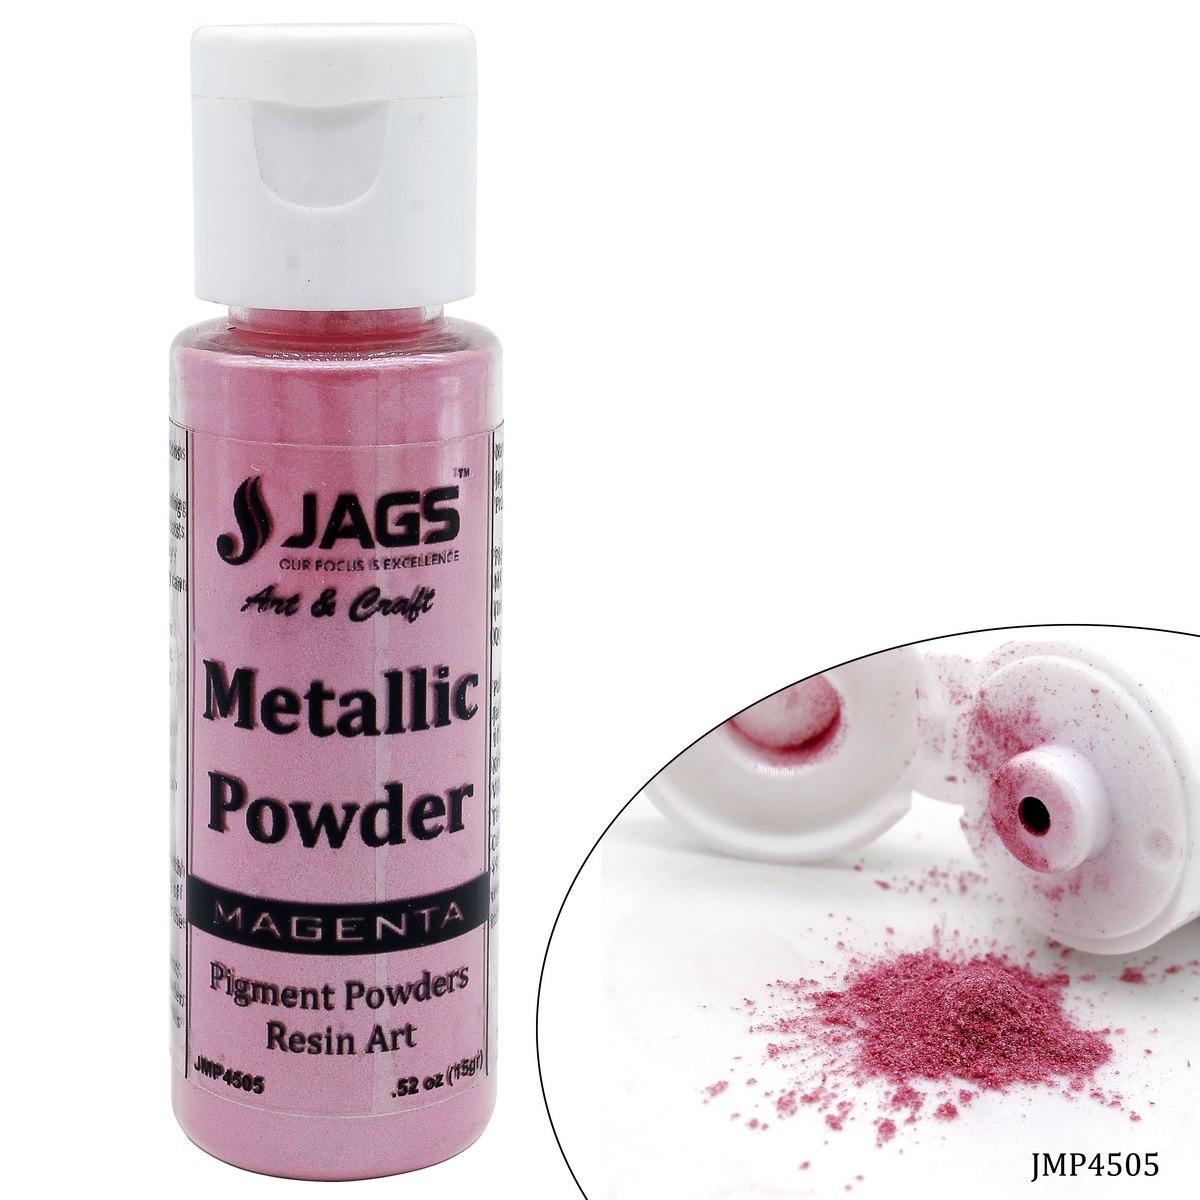 Jags Metallic Powder Magenta 15Gms JMP4505